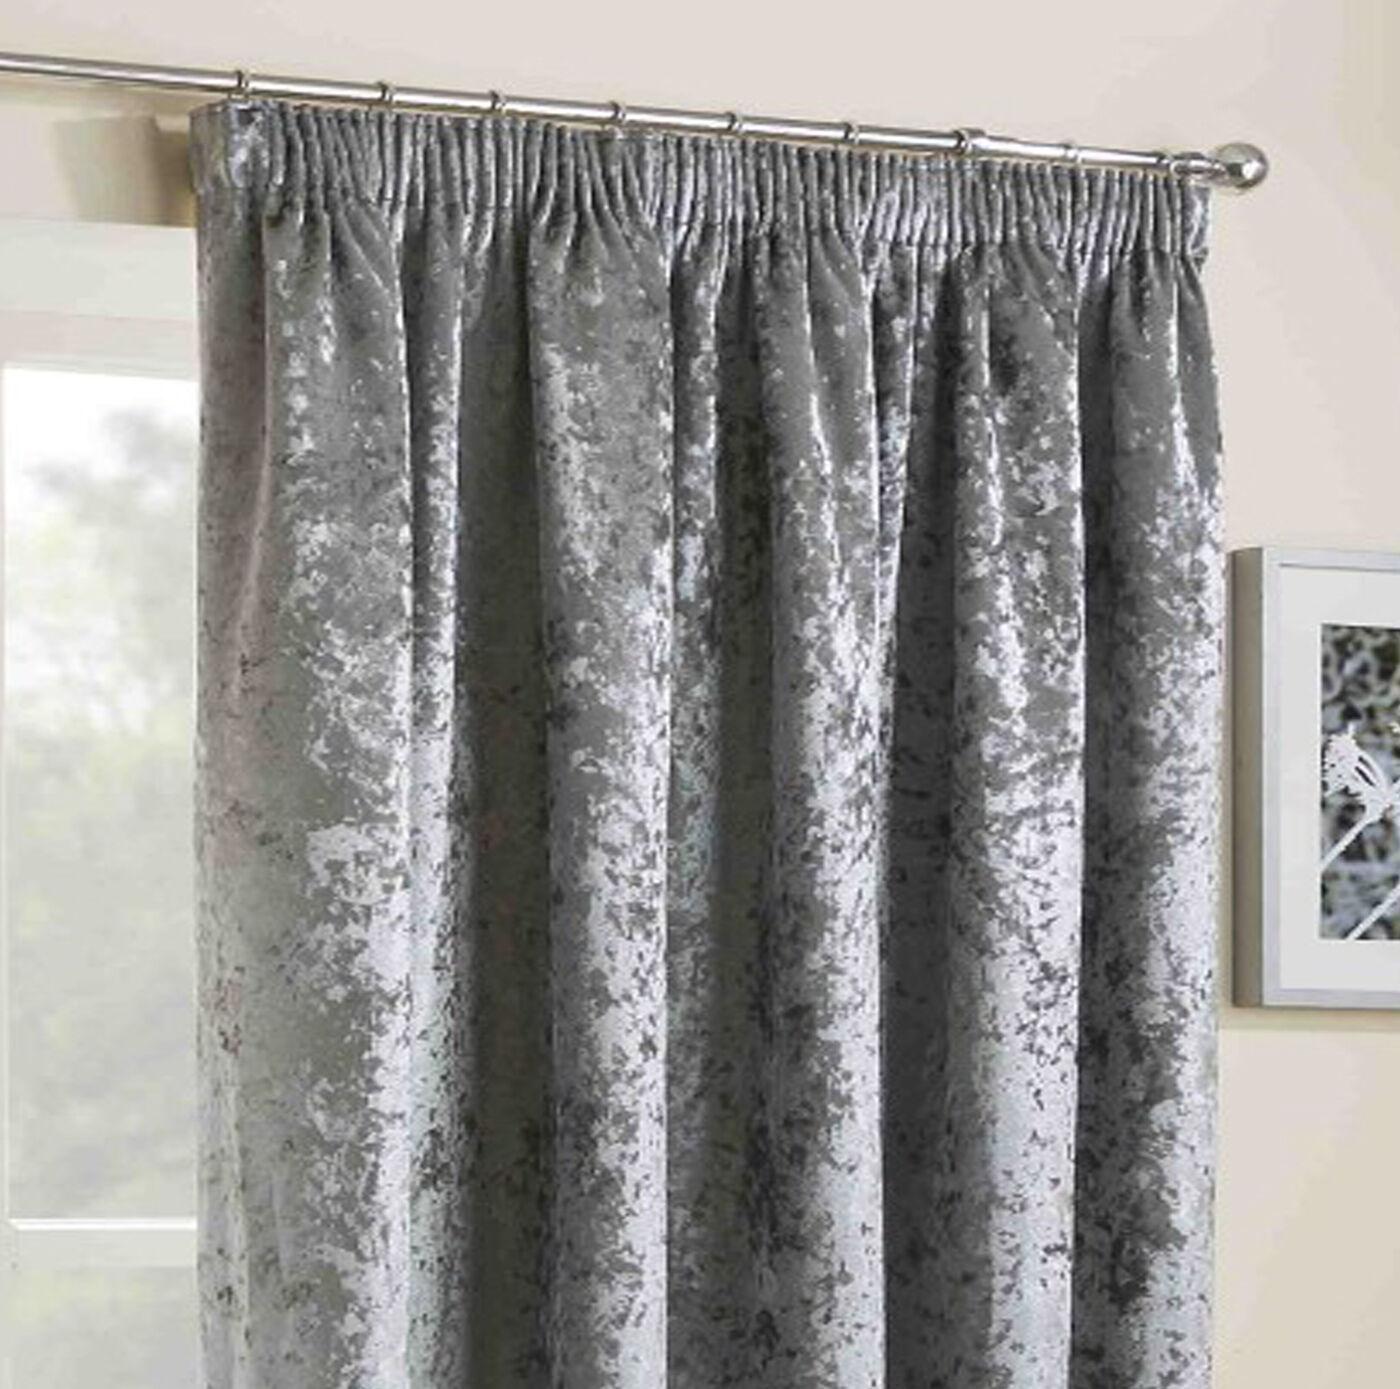 crushed curtains velvet 3 pencil pleated headed tape. Black Bedroom Furniture Sets. Home Design Ideas